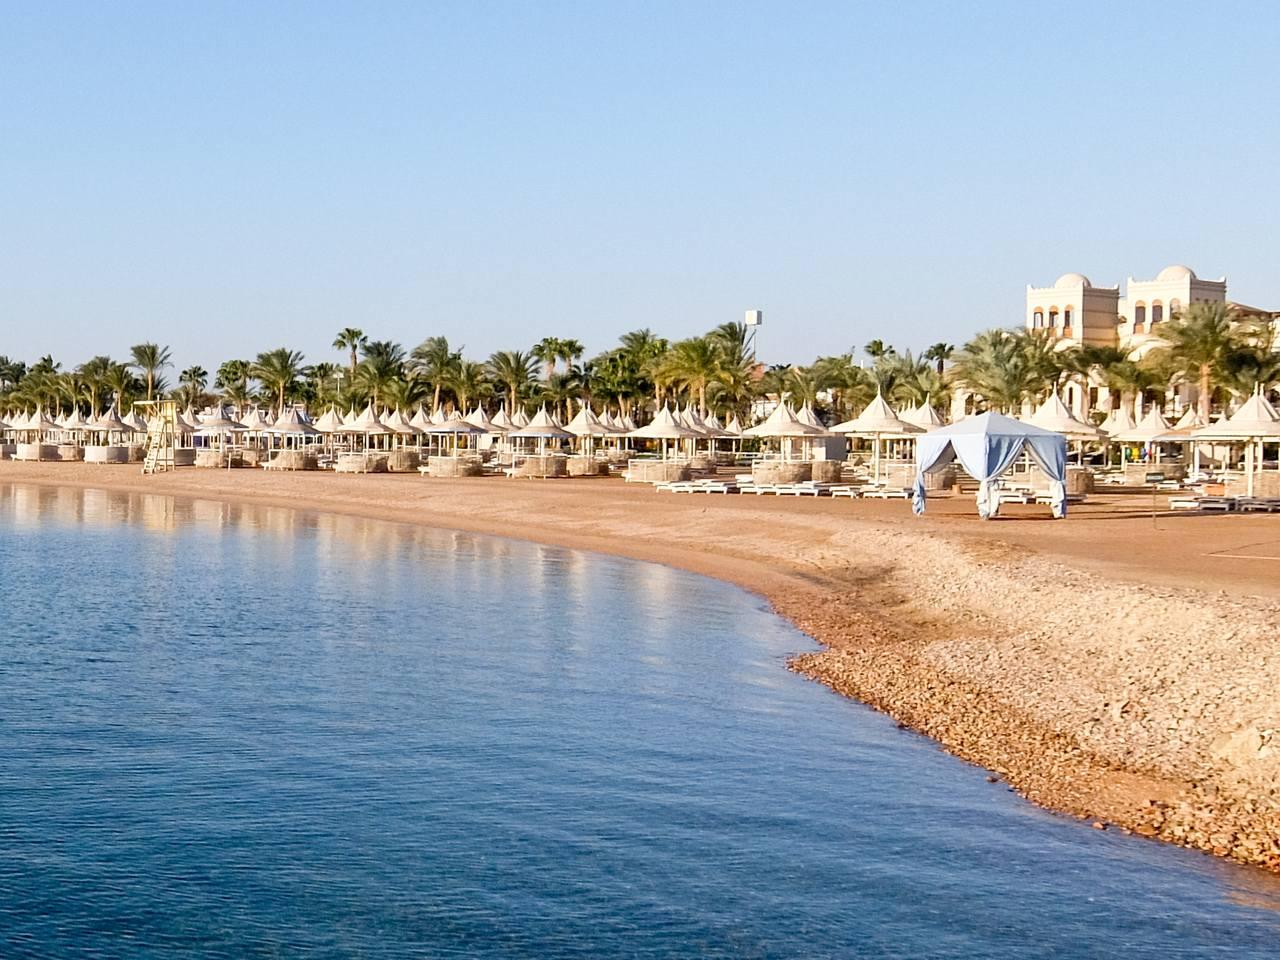 Grand Palace Beach